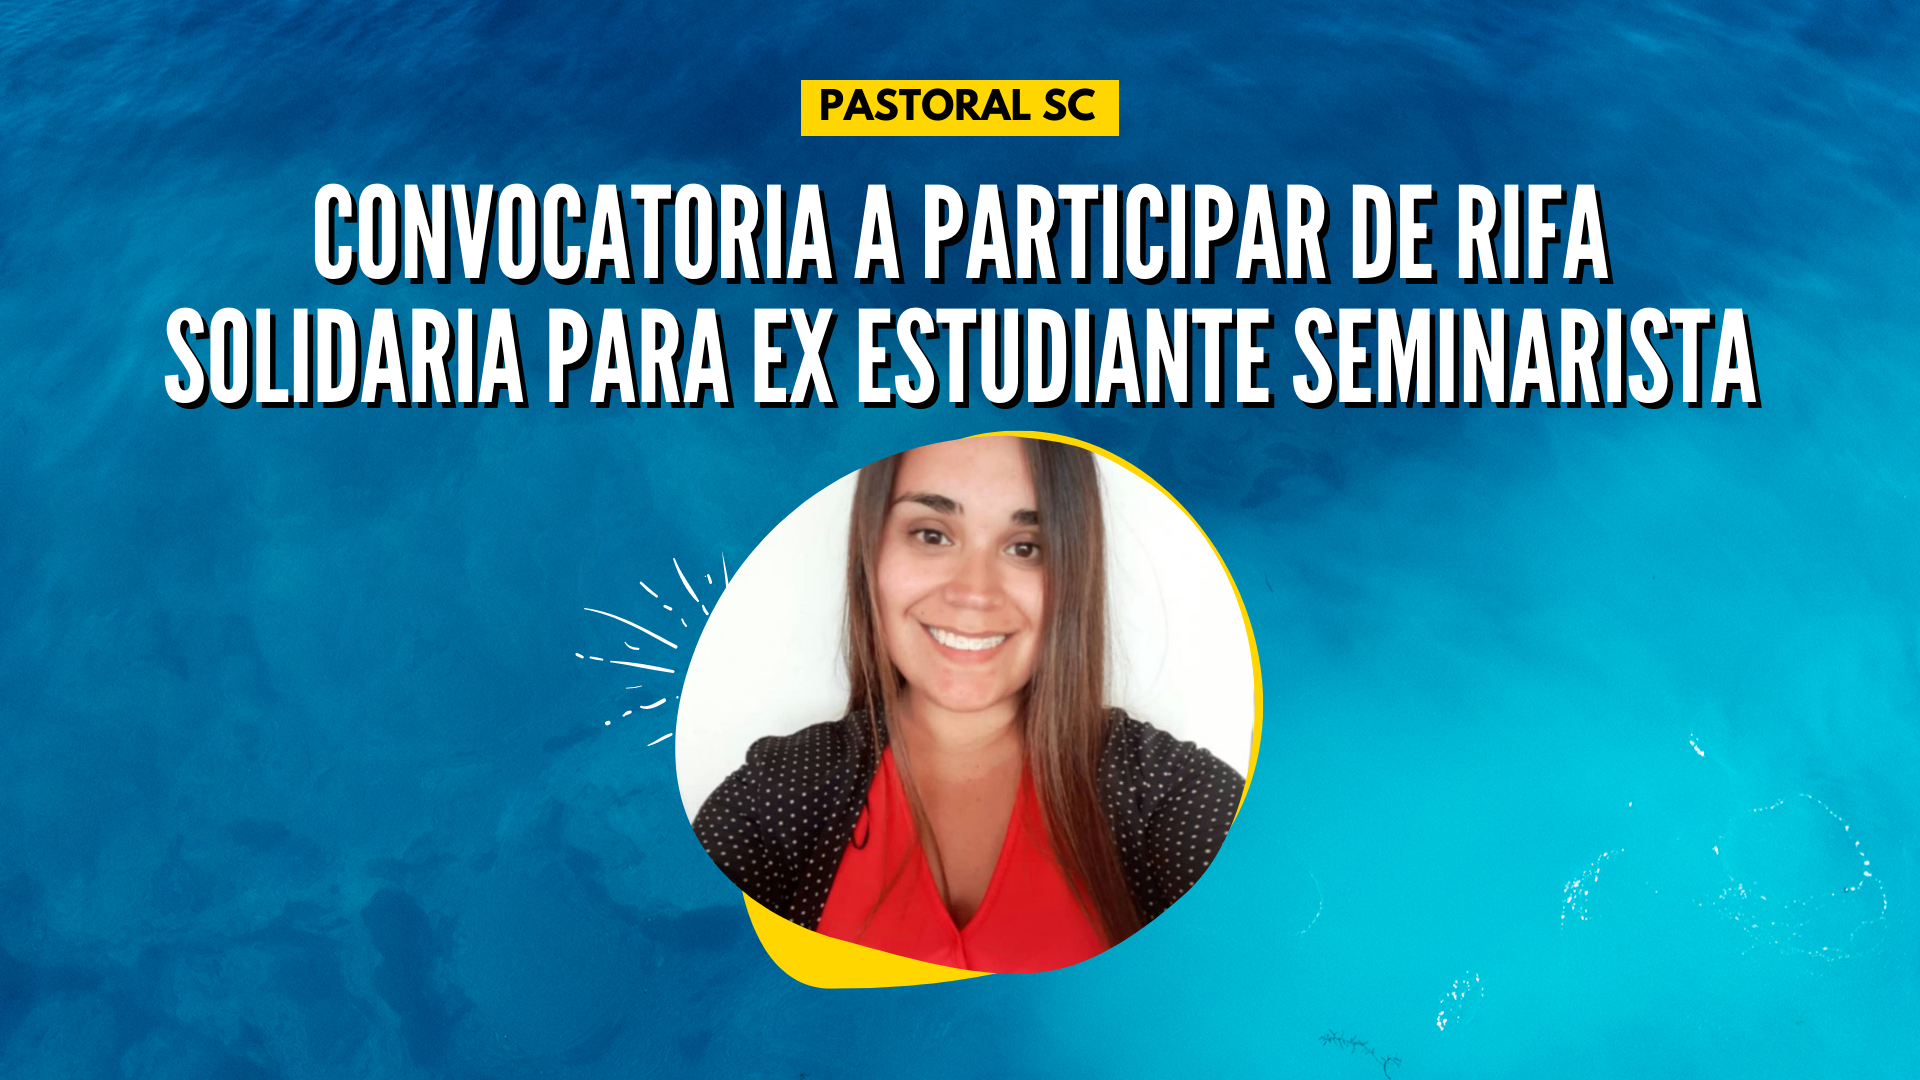 CONVOCATORIA A PARTICIPAR DE RIFA SOLIDARIA PARA EX ESTUDIANTE SEMINARISTA